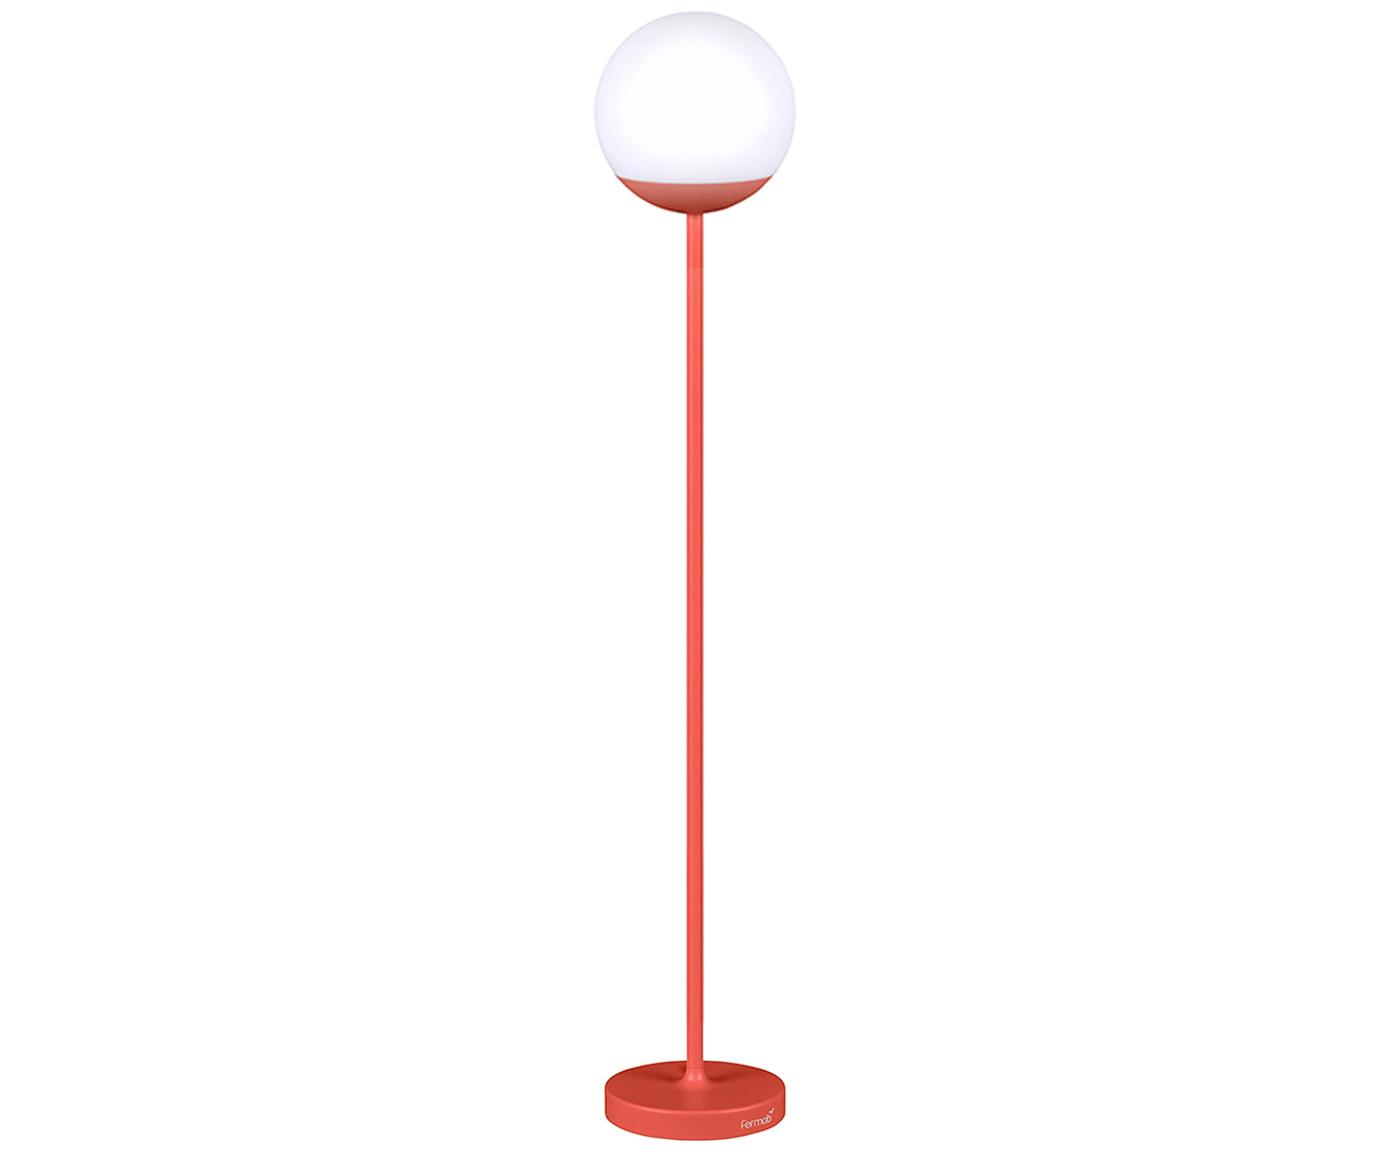 Mobile LED Aussenleuchte Mooon, Lampenschirm: Kunststoff, Rot, Ø 25 x H 134 cm